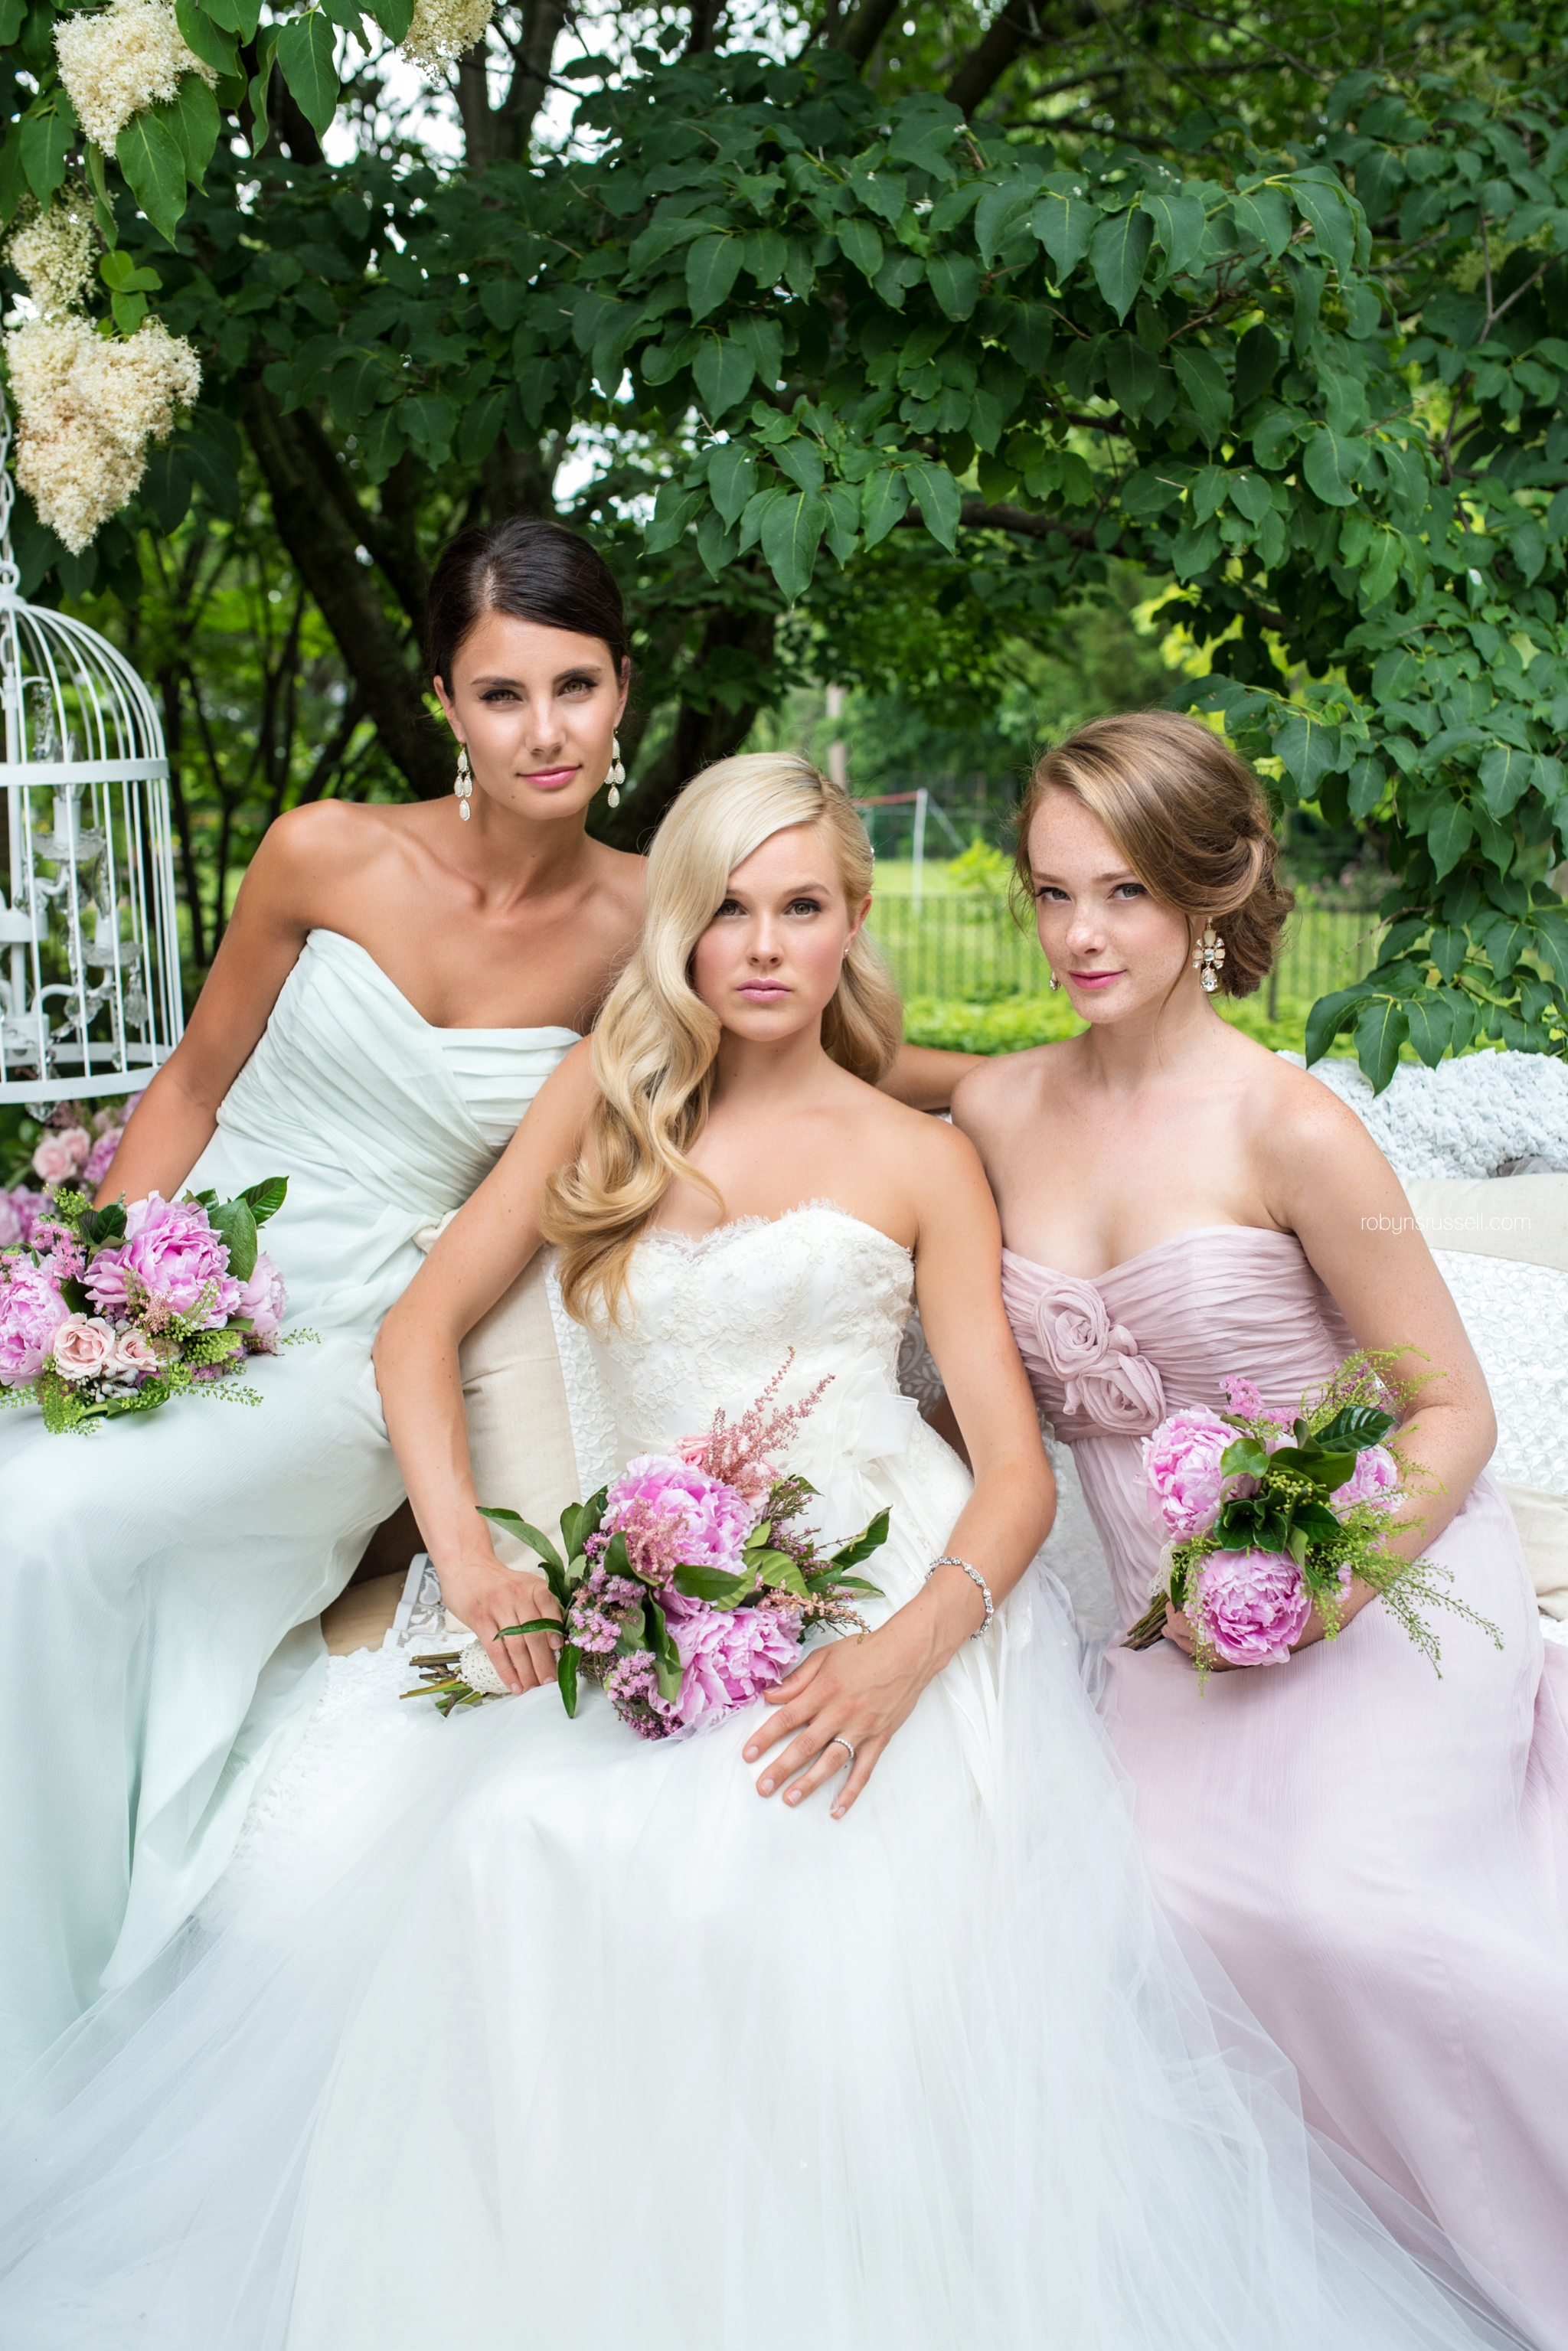 2-bride-and-bridesmaids-oakville.jpg